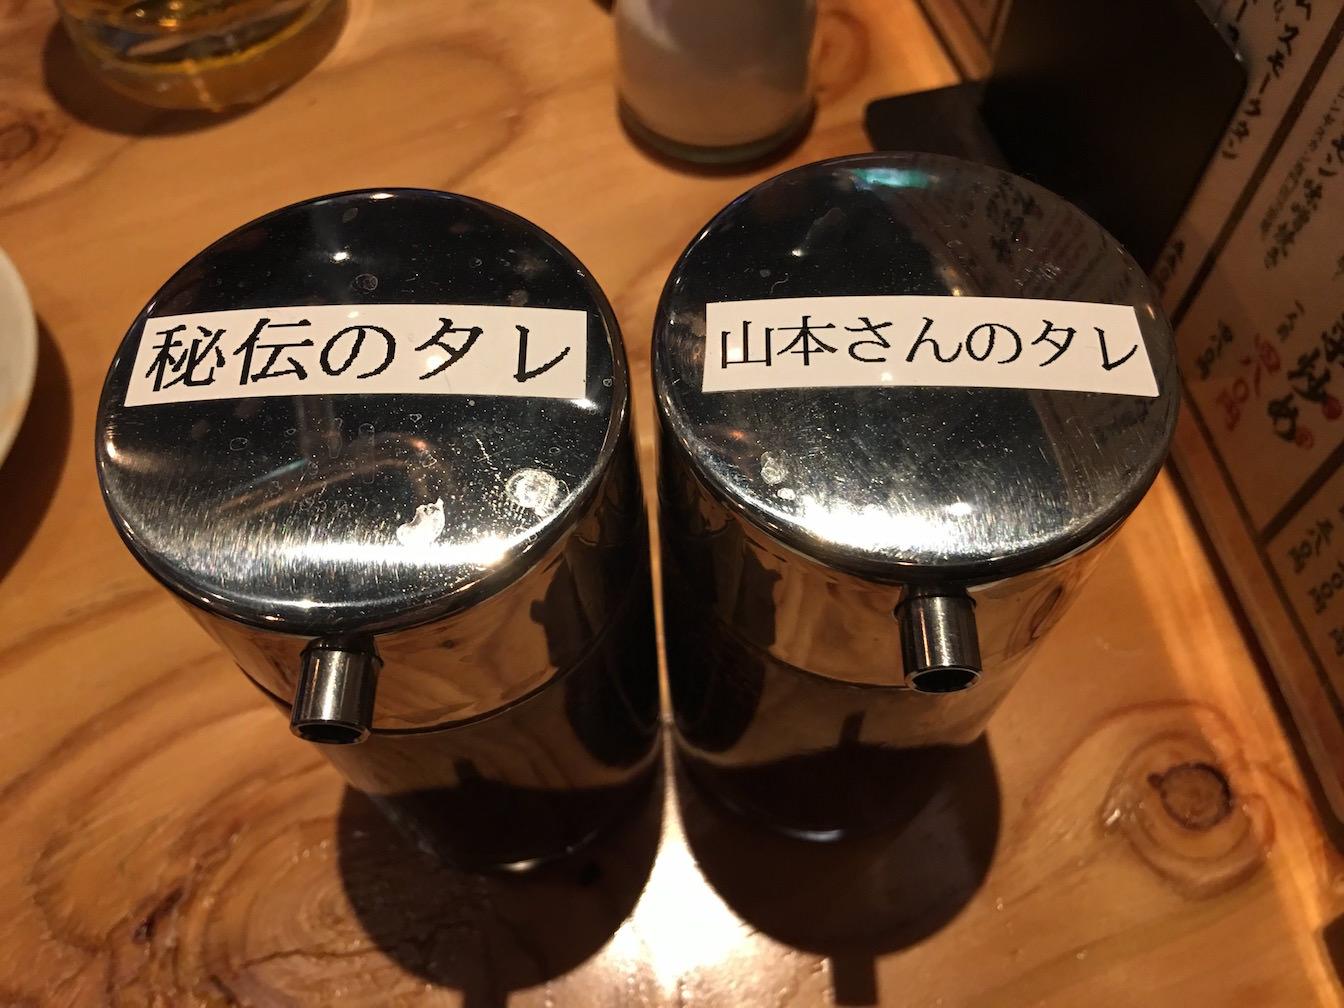 Suidobashi jingisukan godai 7